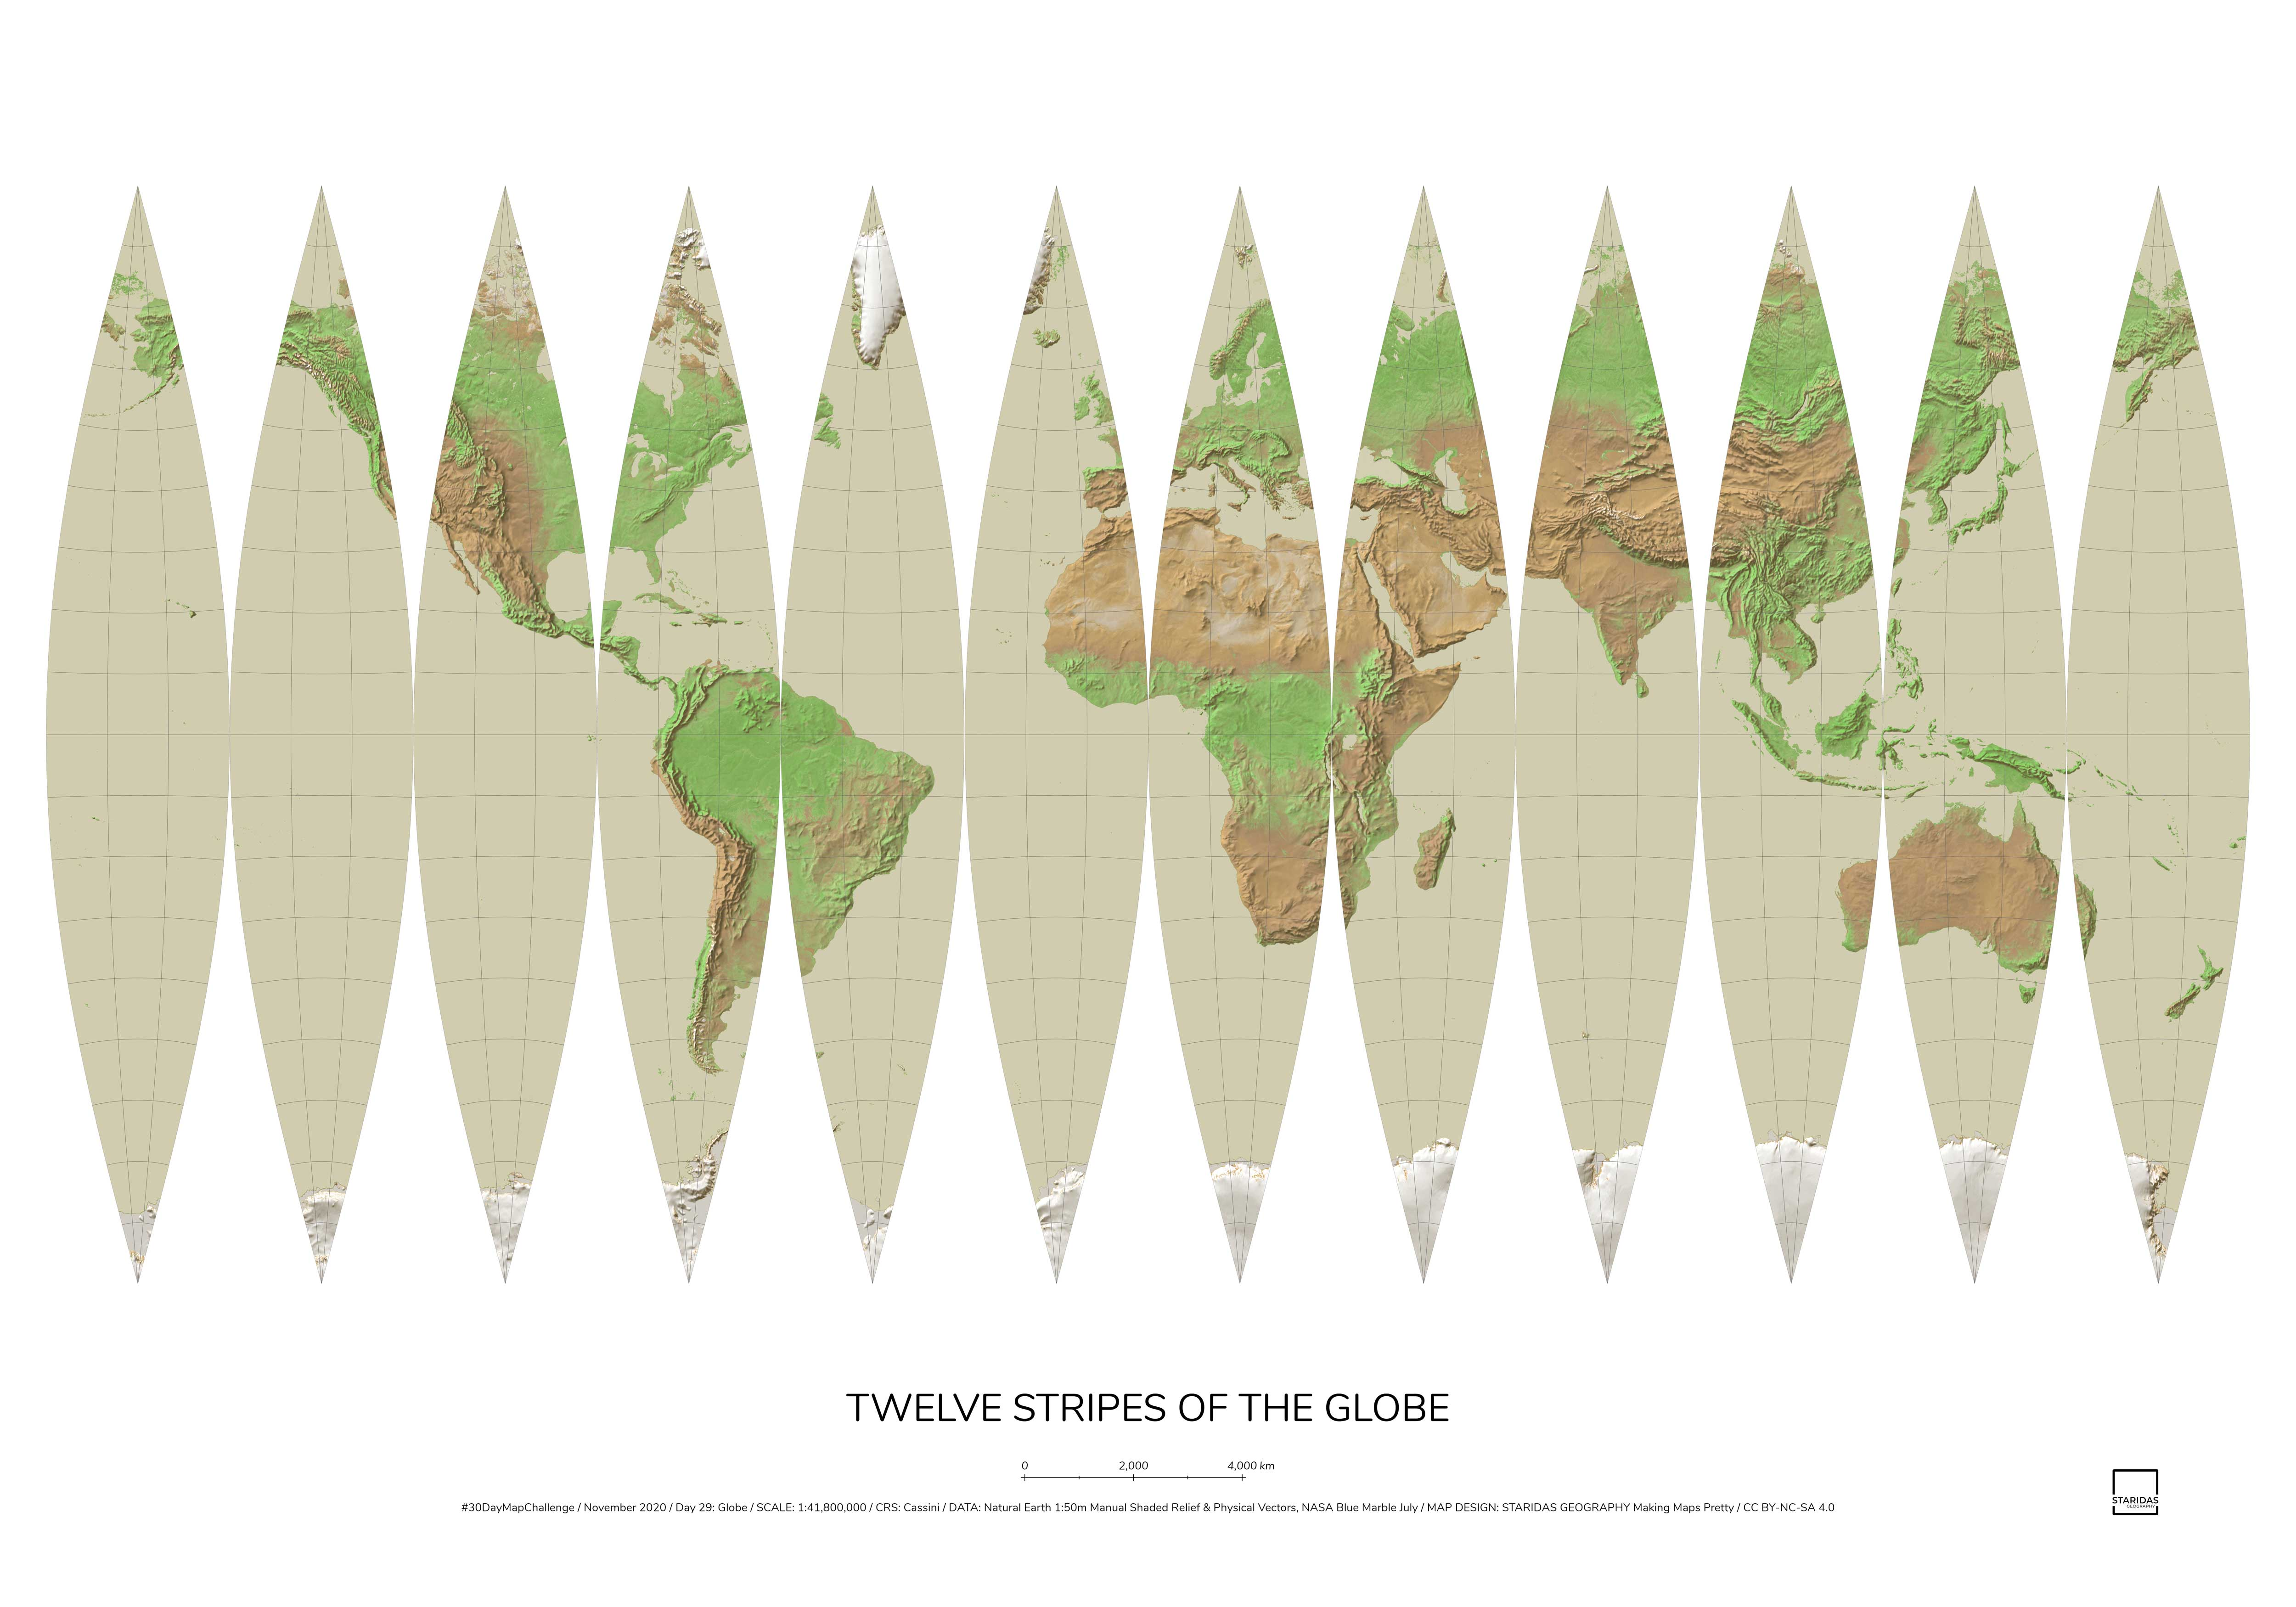 Twelve Stripes of the Globe